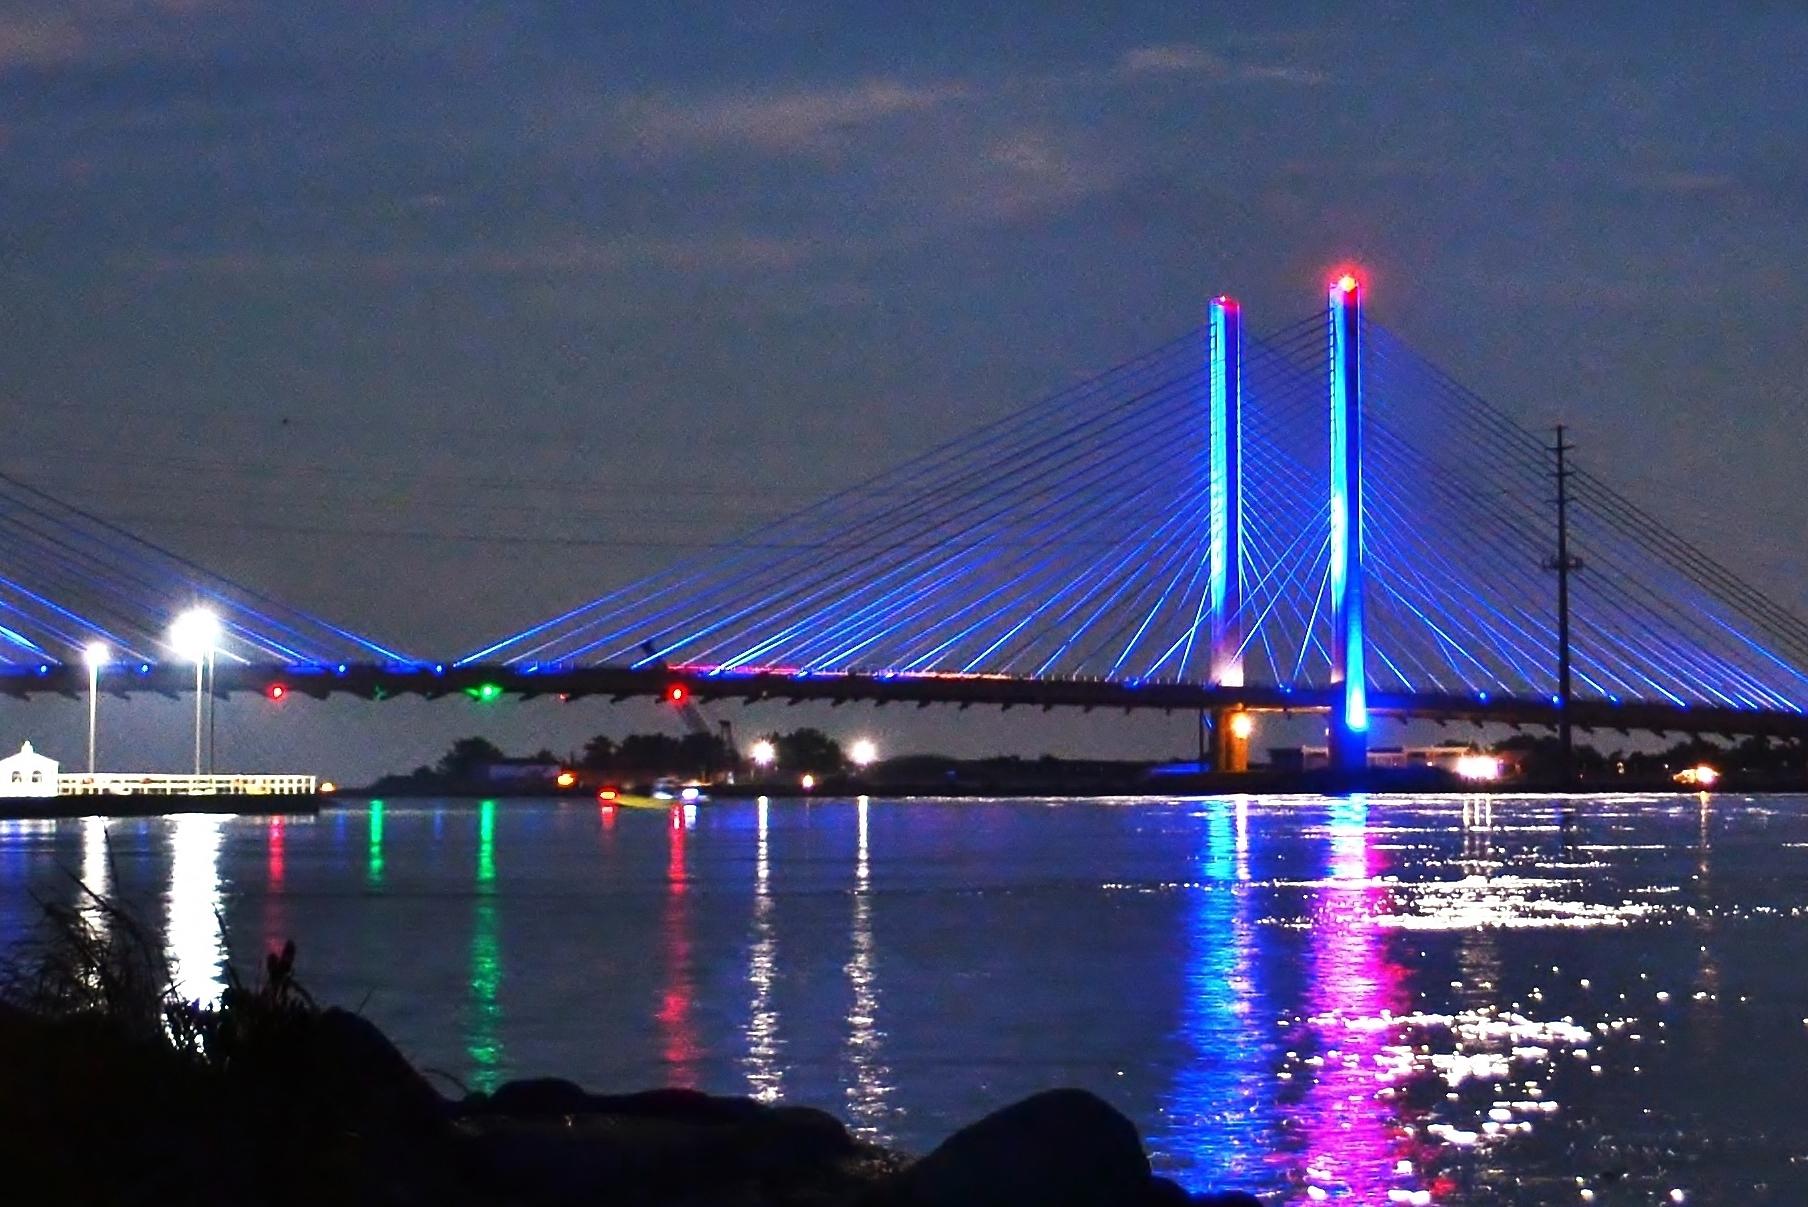 IRI 03 4x6 Indian River Inlet Bridge Full Moon_2.JPG